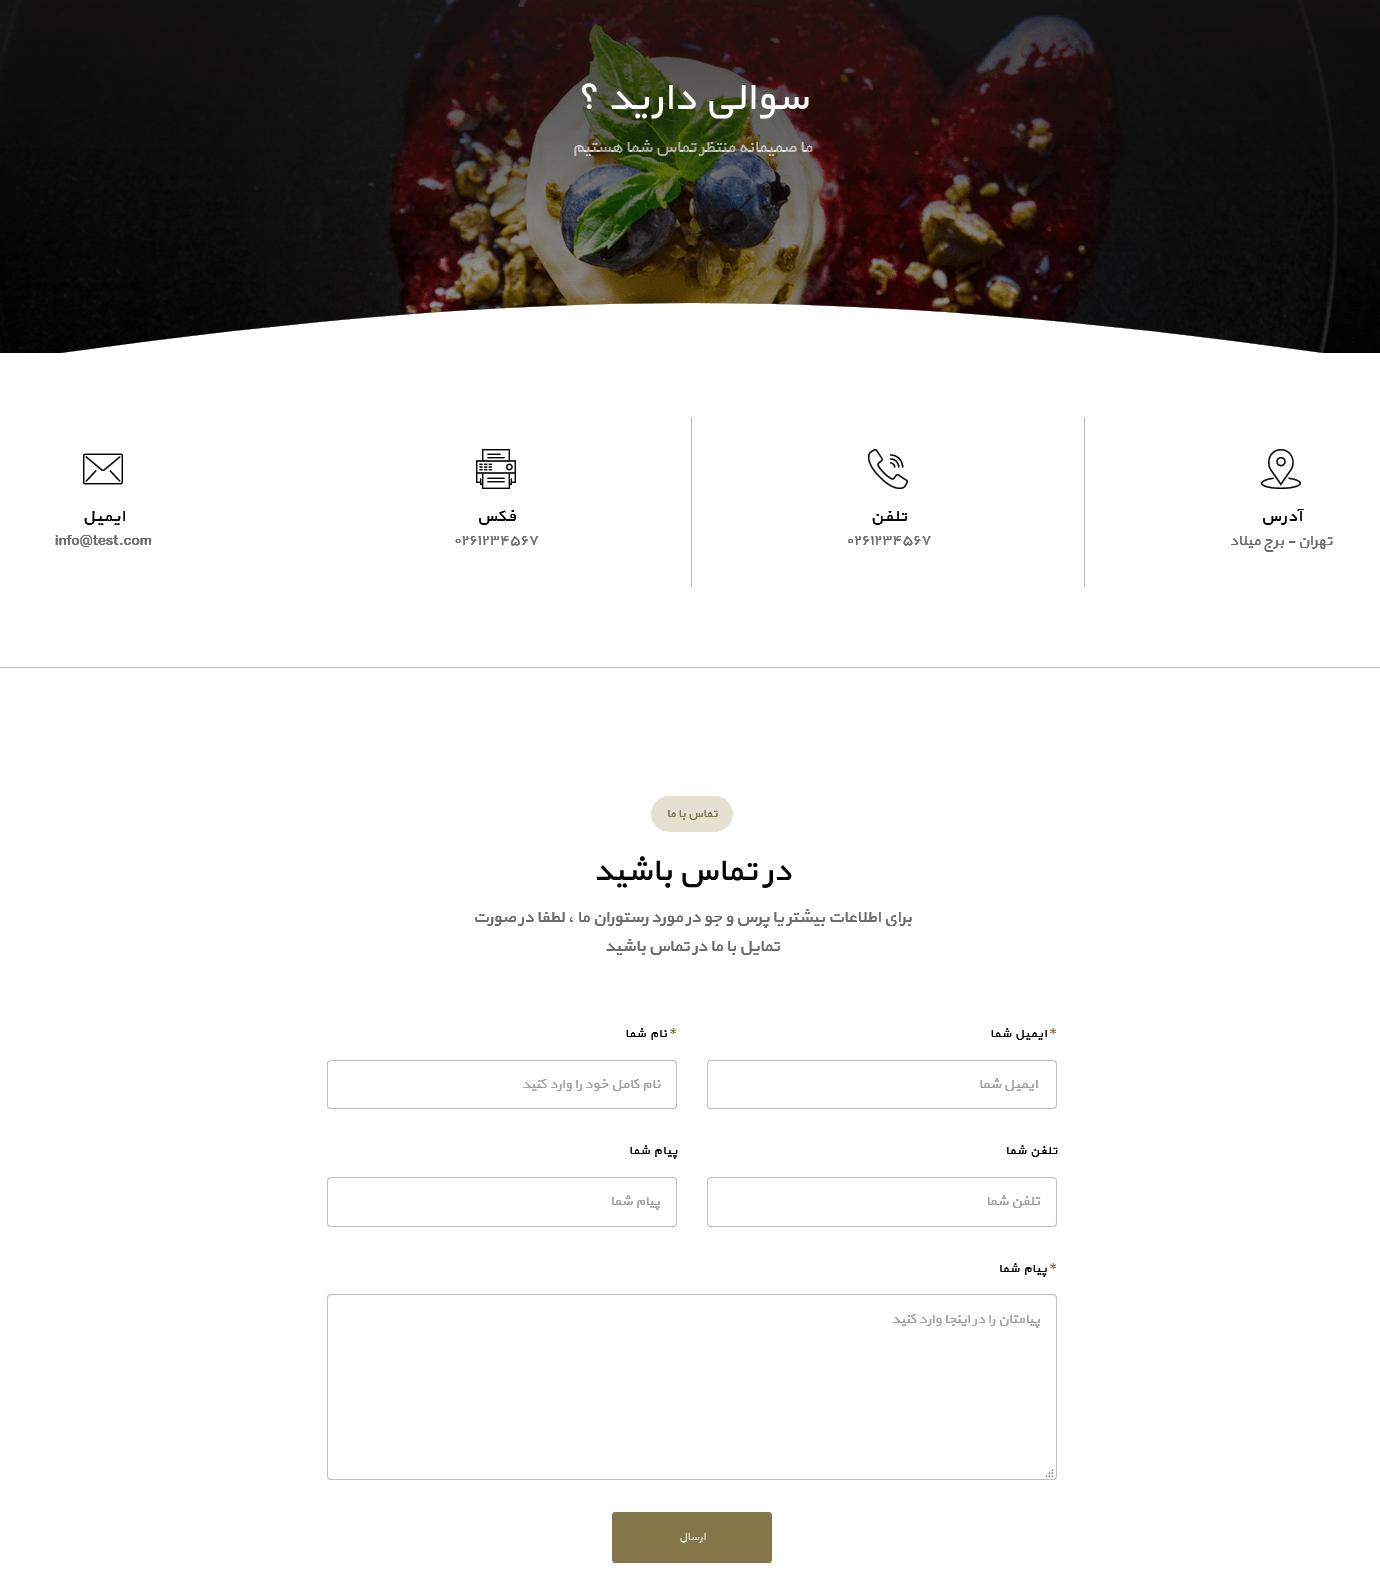 صفحه تماس قالب Foxresto